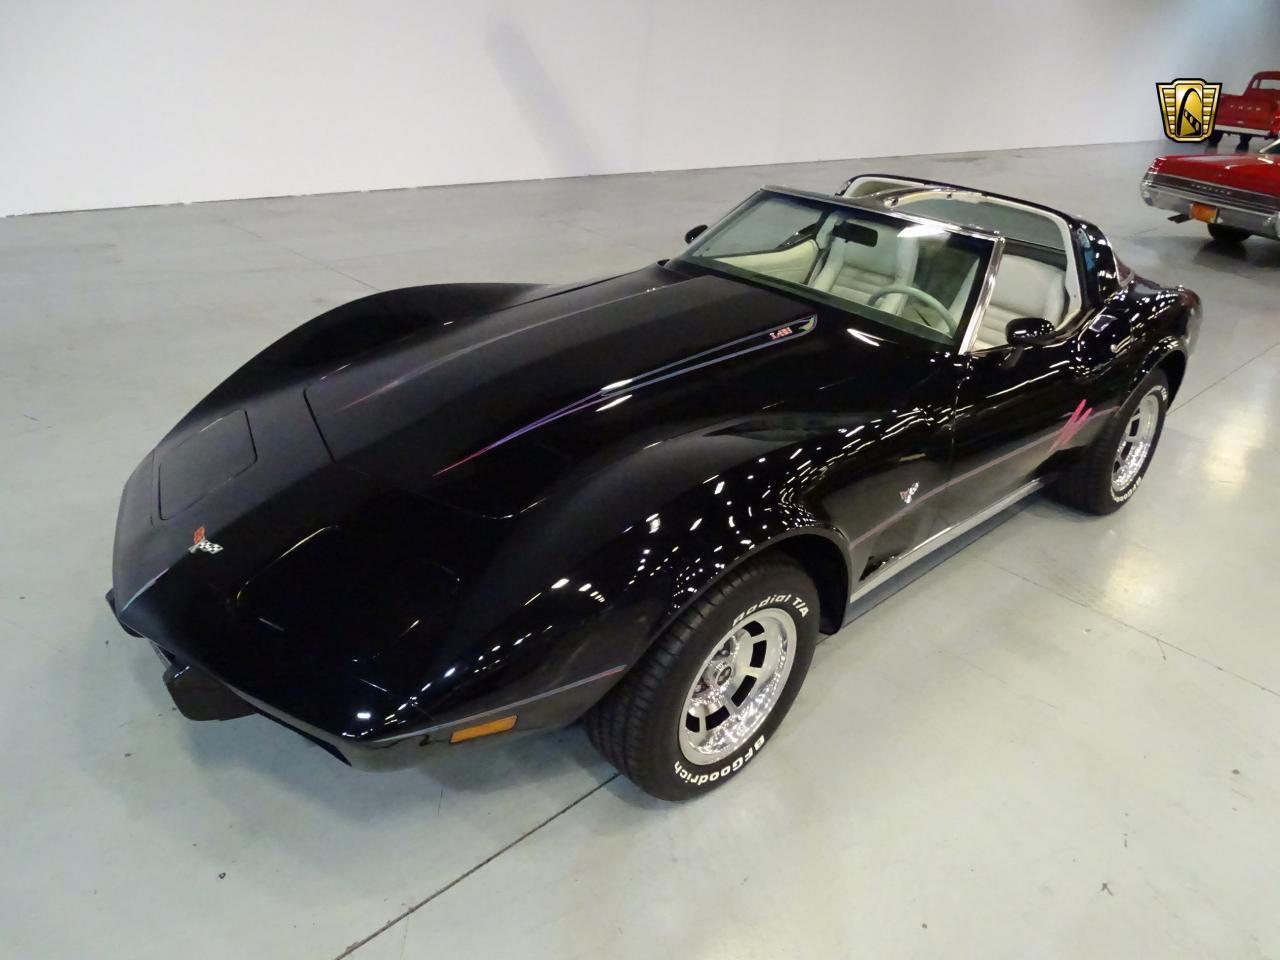 Large Picture of 1979 Chevrolet Corvette located in Florida - $19,995.00 - KDLV